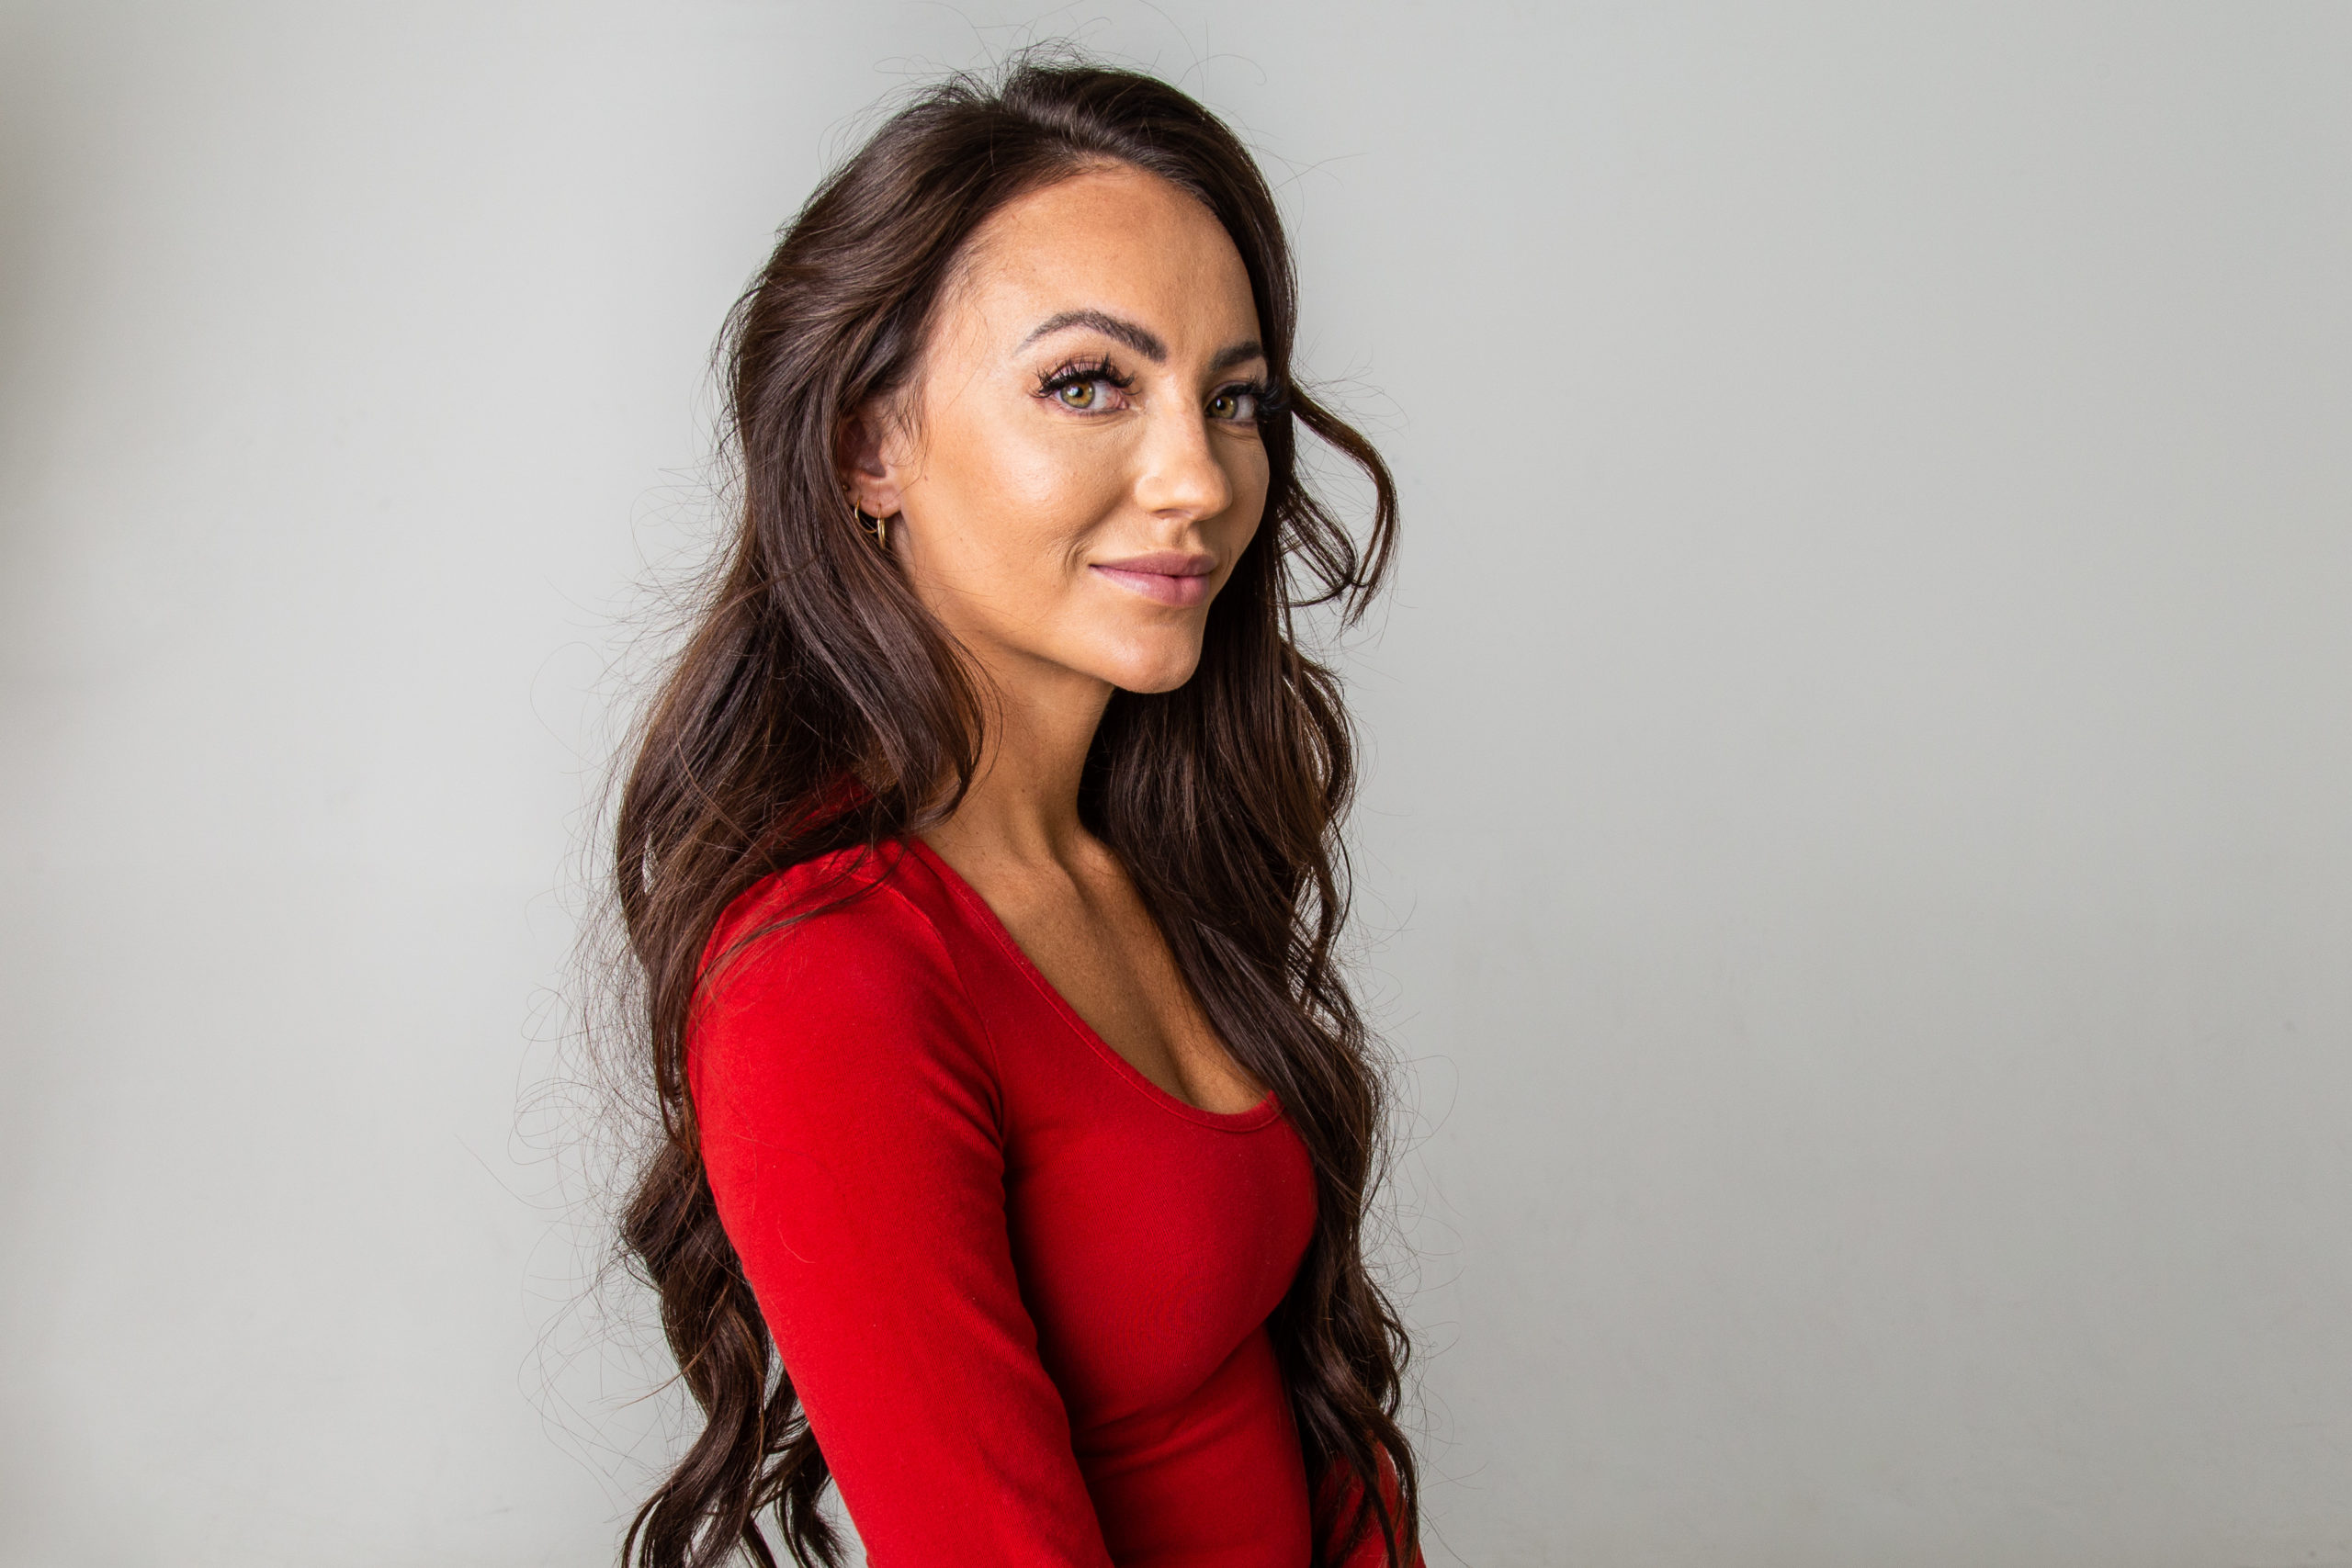 Cassandra Freeman | 2020 20 In Their 20s